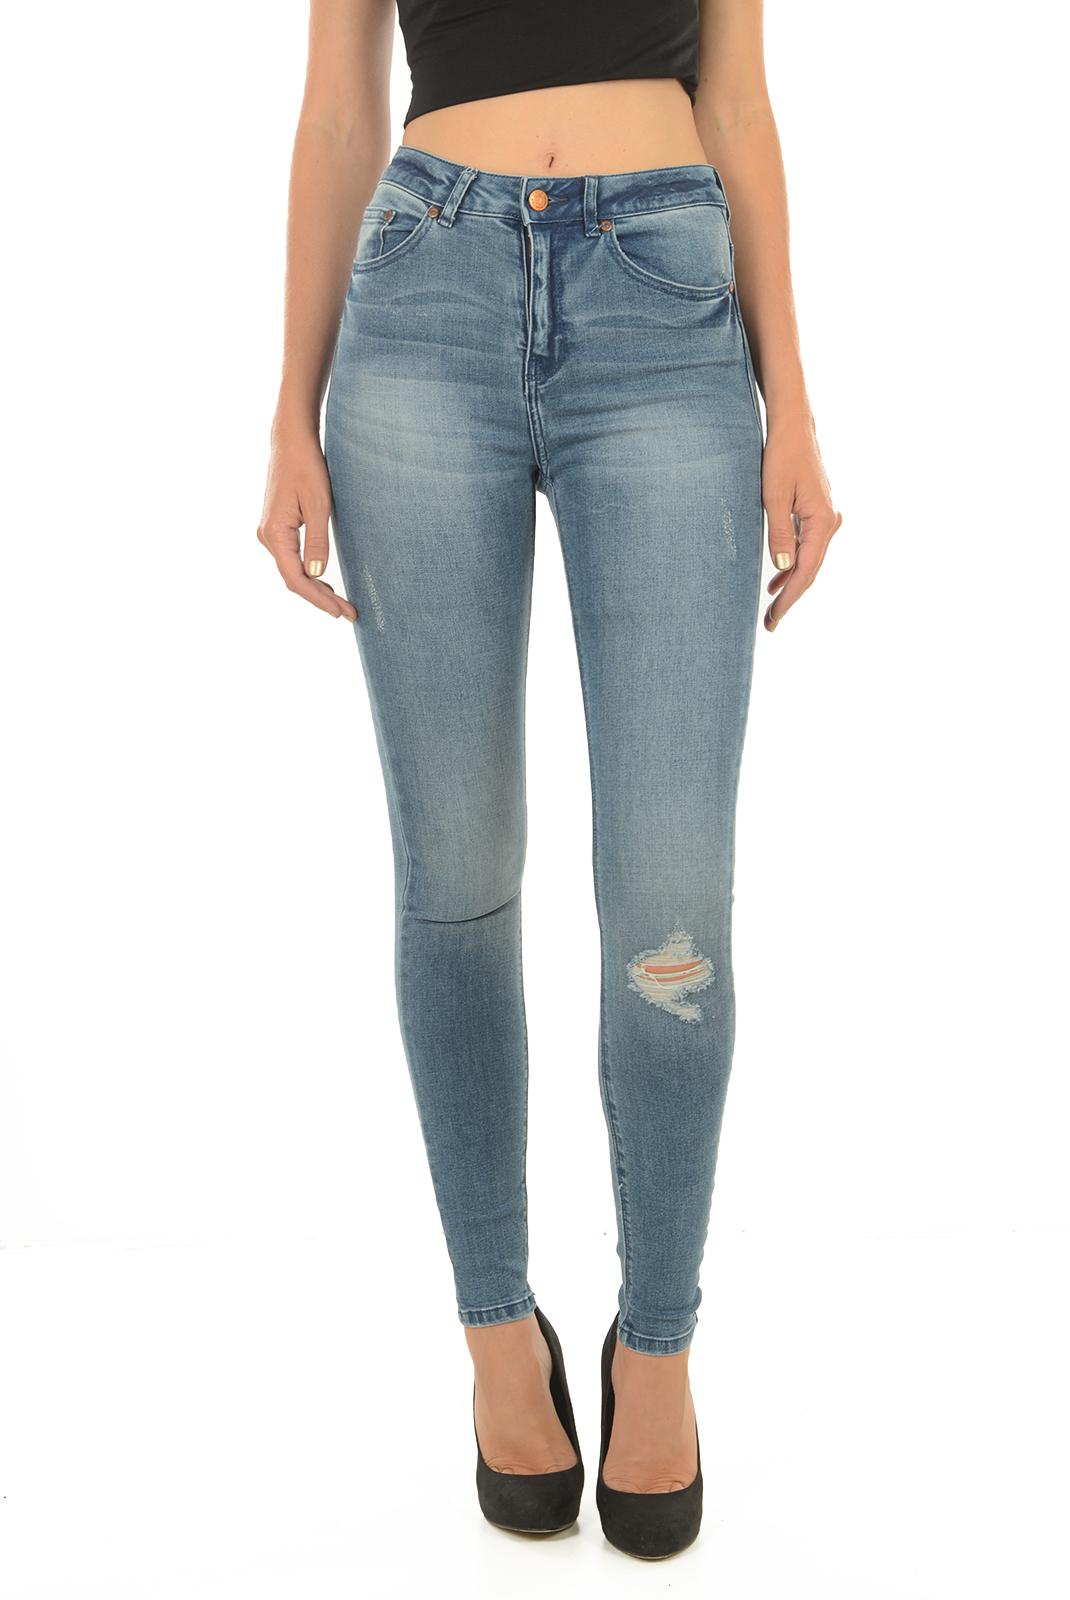 Jeans slim  Only PEARL HW MB JEANS DNM MEDIUM BLUE DENIM